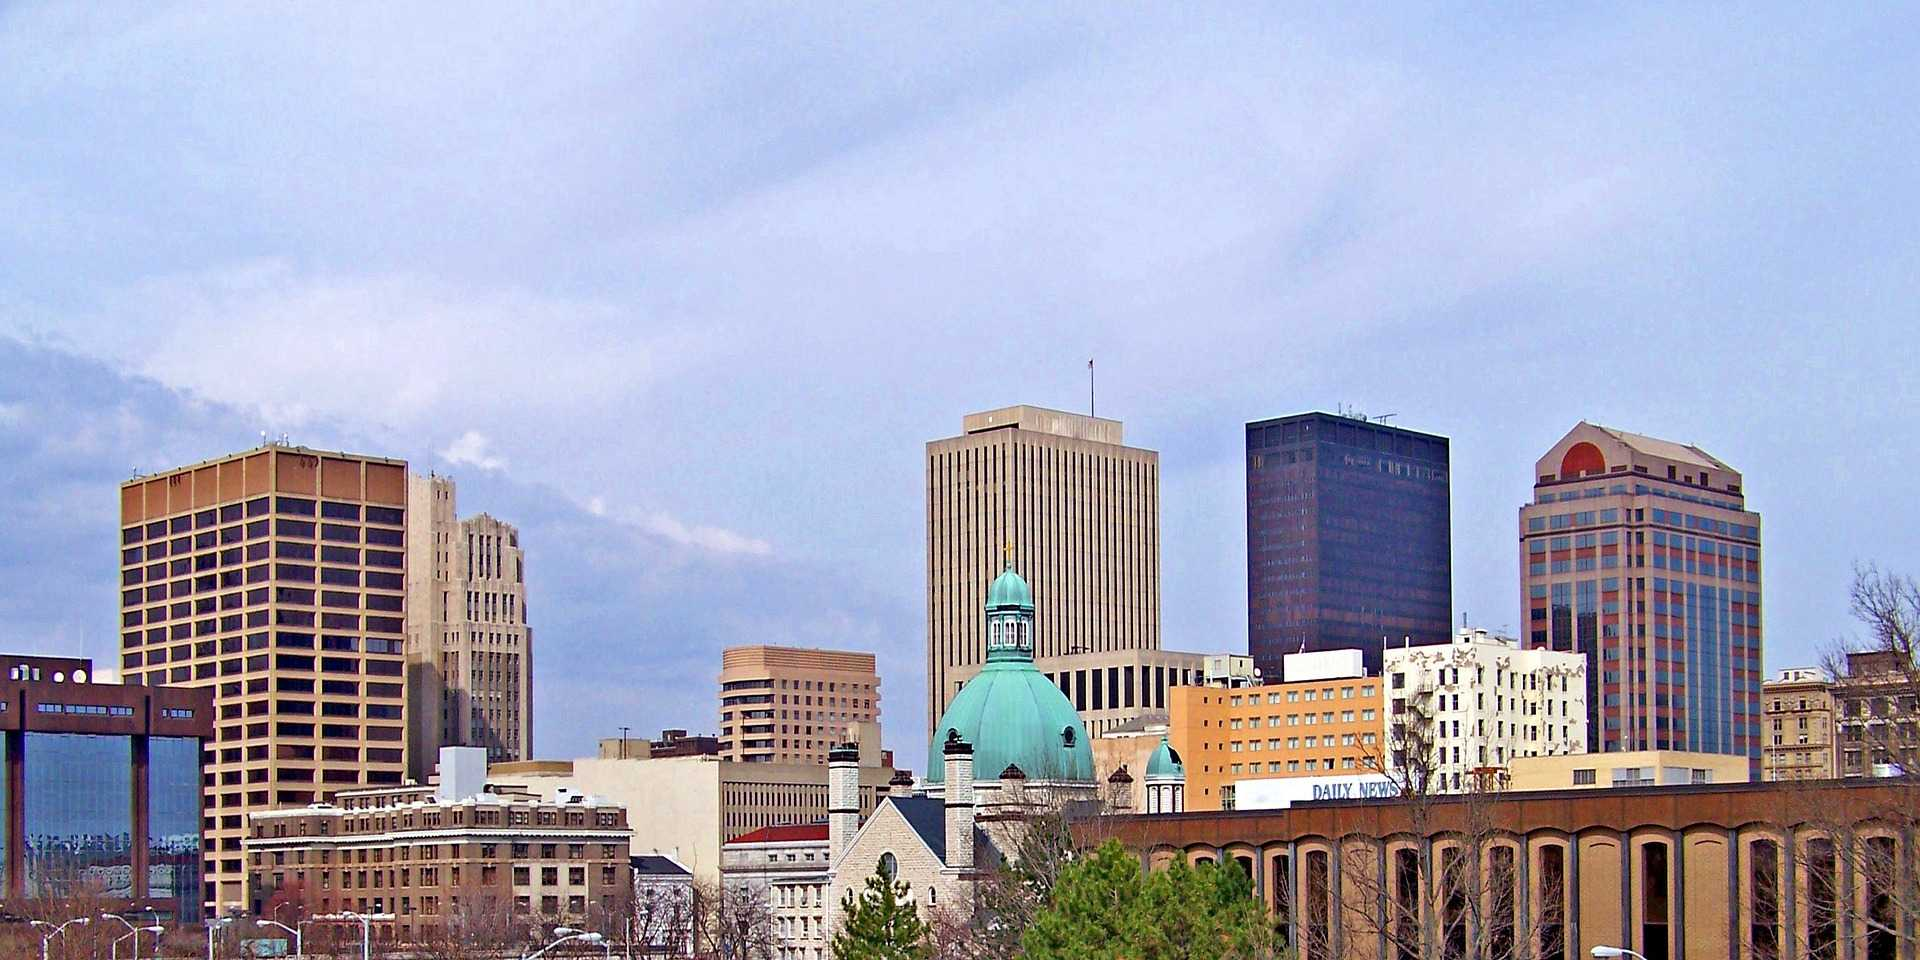 Pic of downtown Dayton